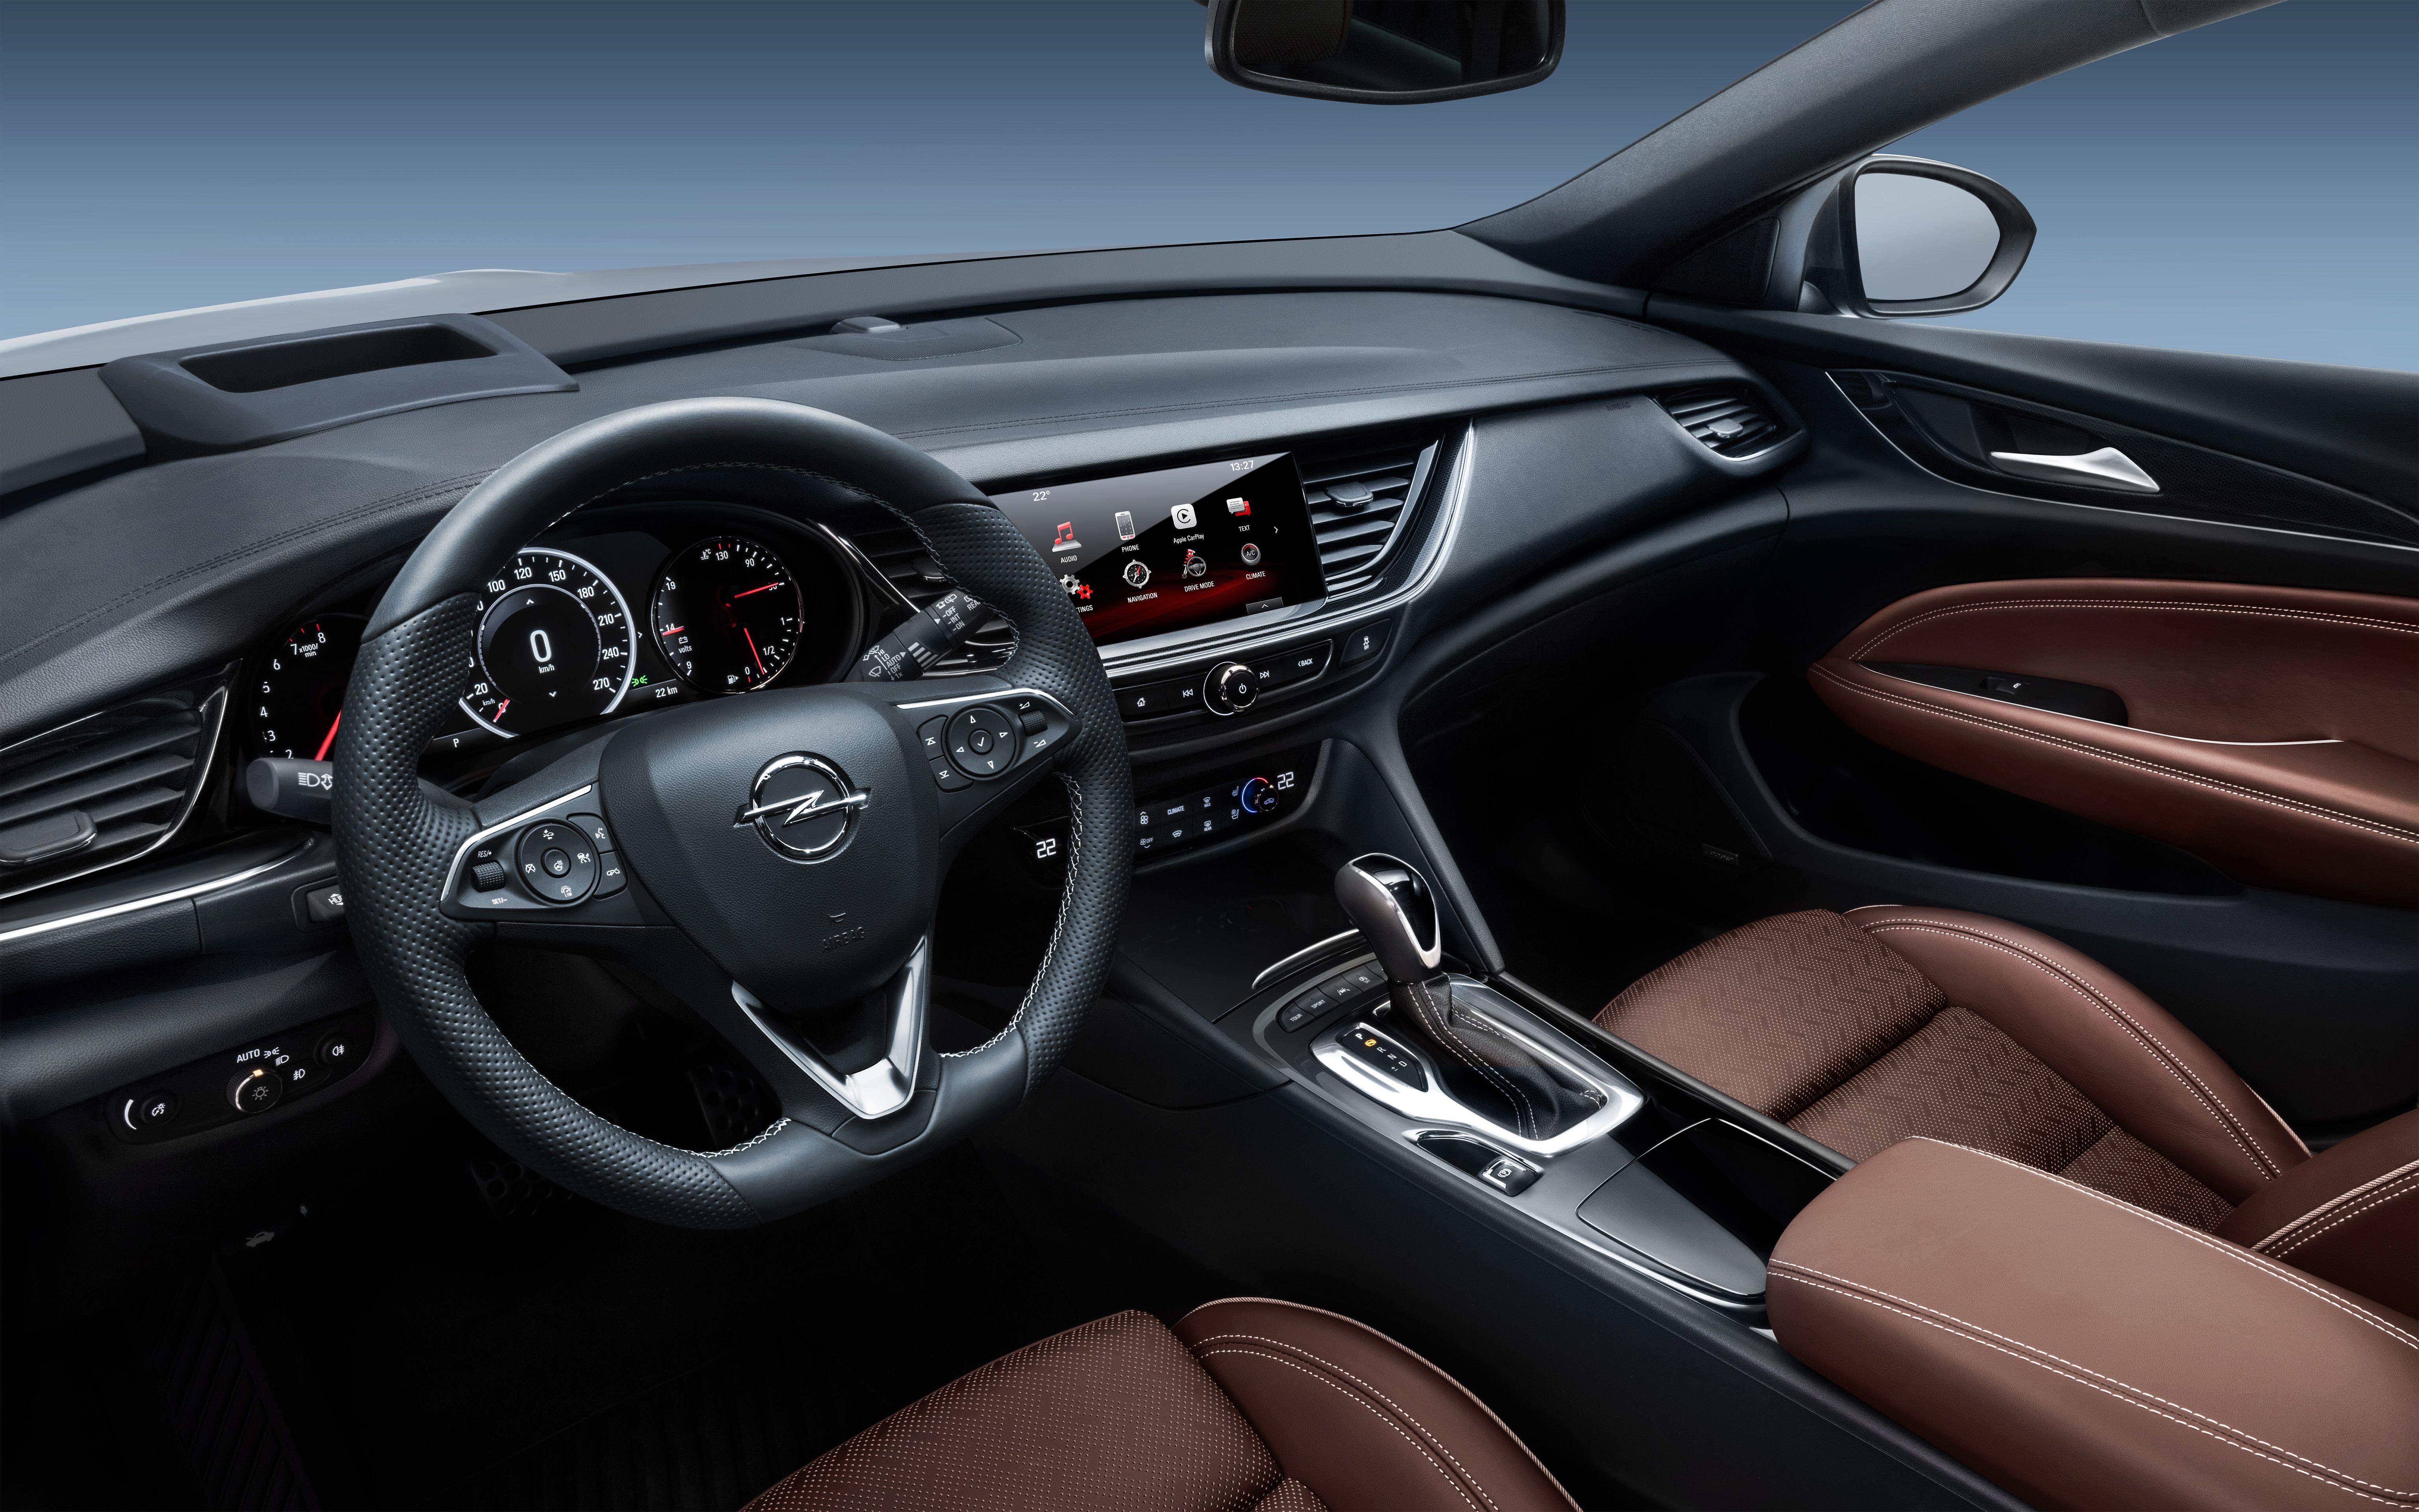 Opel Insignia Grand Sport 1 6 Benzin Fahren Sport Autos